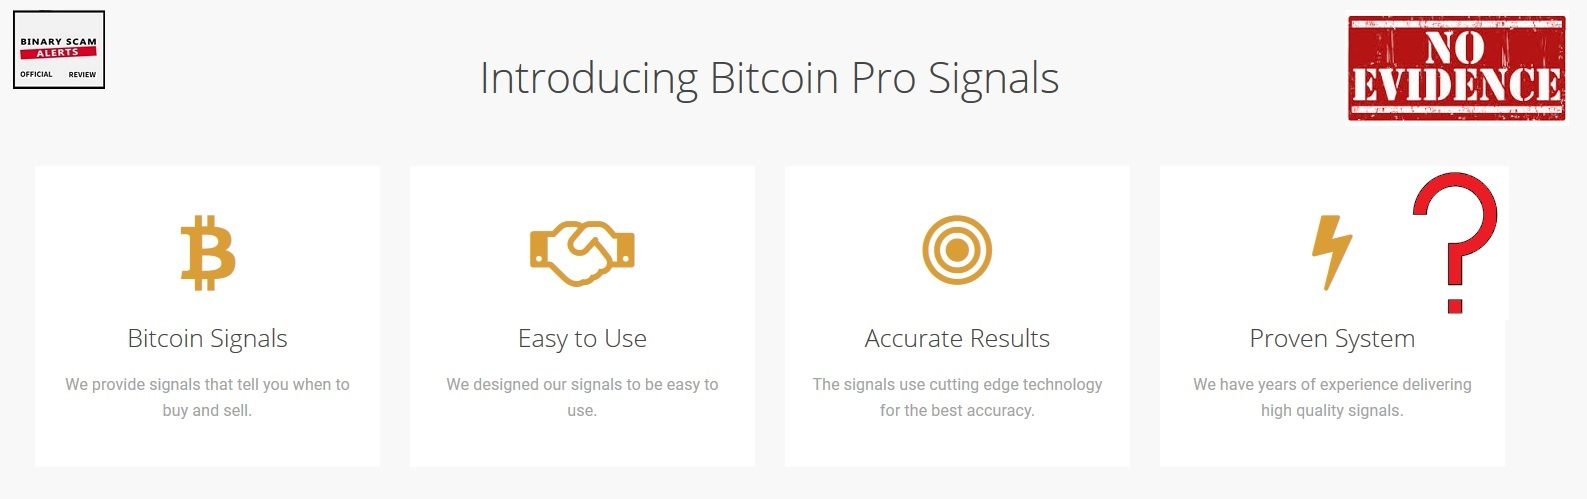 Bitcoin Pro Signals Review, SCAM Bitcoin Pro Signals